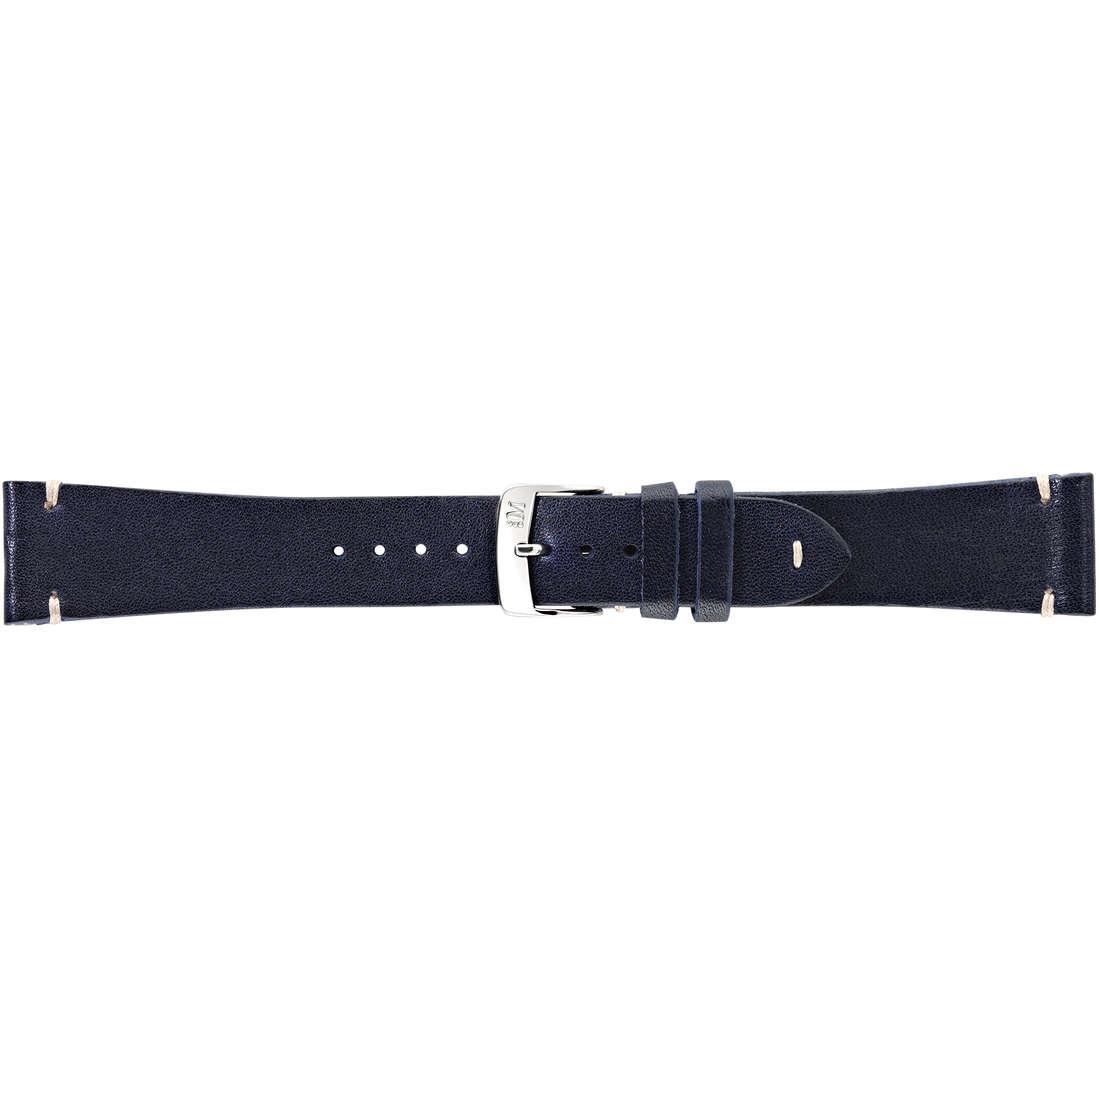 watch watch bands watch straps man Morellato Manufatti A01X4541A76062CR18